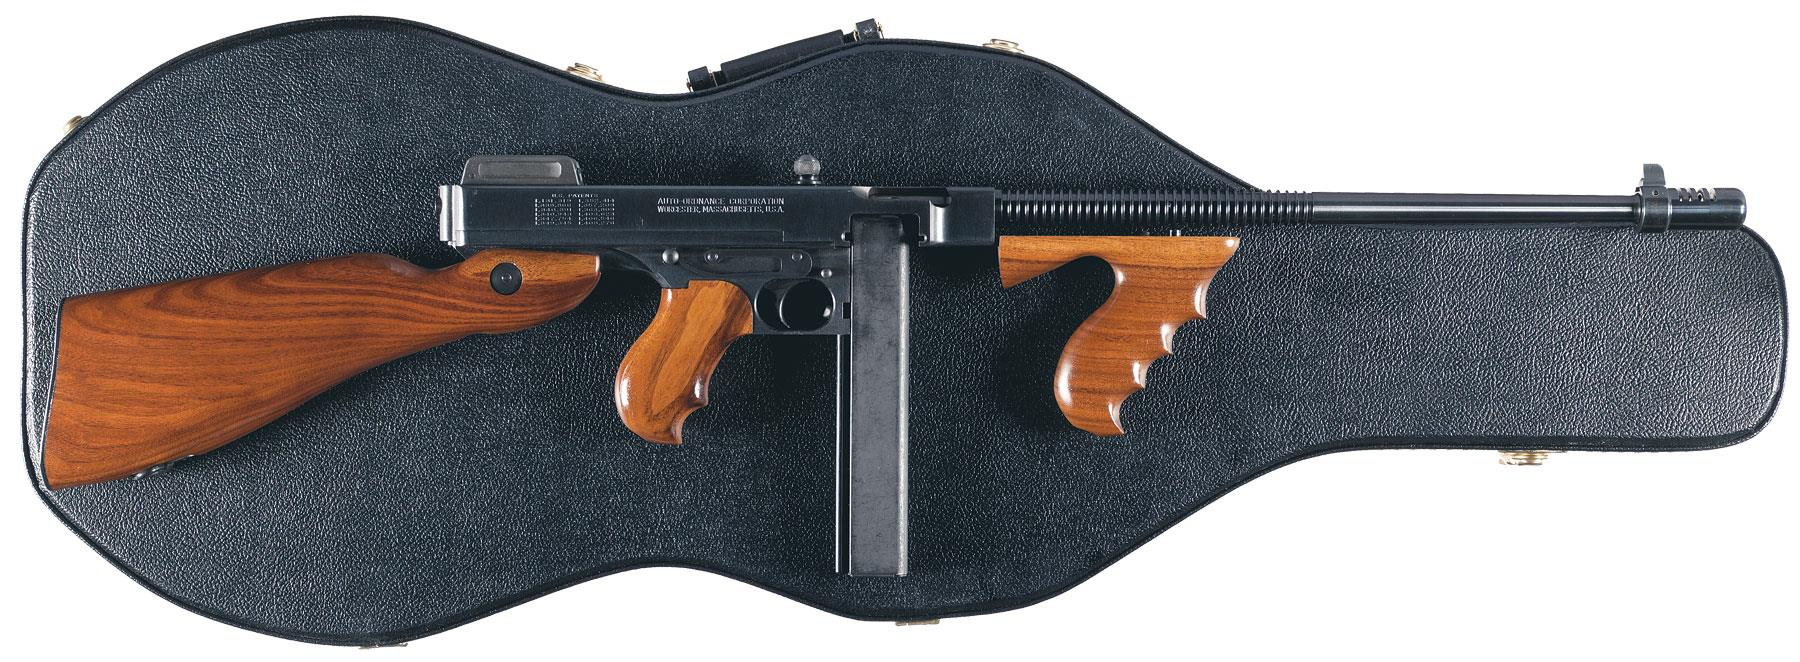 b79e9c931c7379 Lot 678  Auto Ordnance Corp Thompson 1927 A1 Standard-Rifle 45 ACP